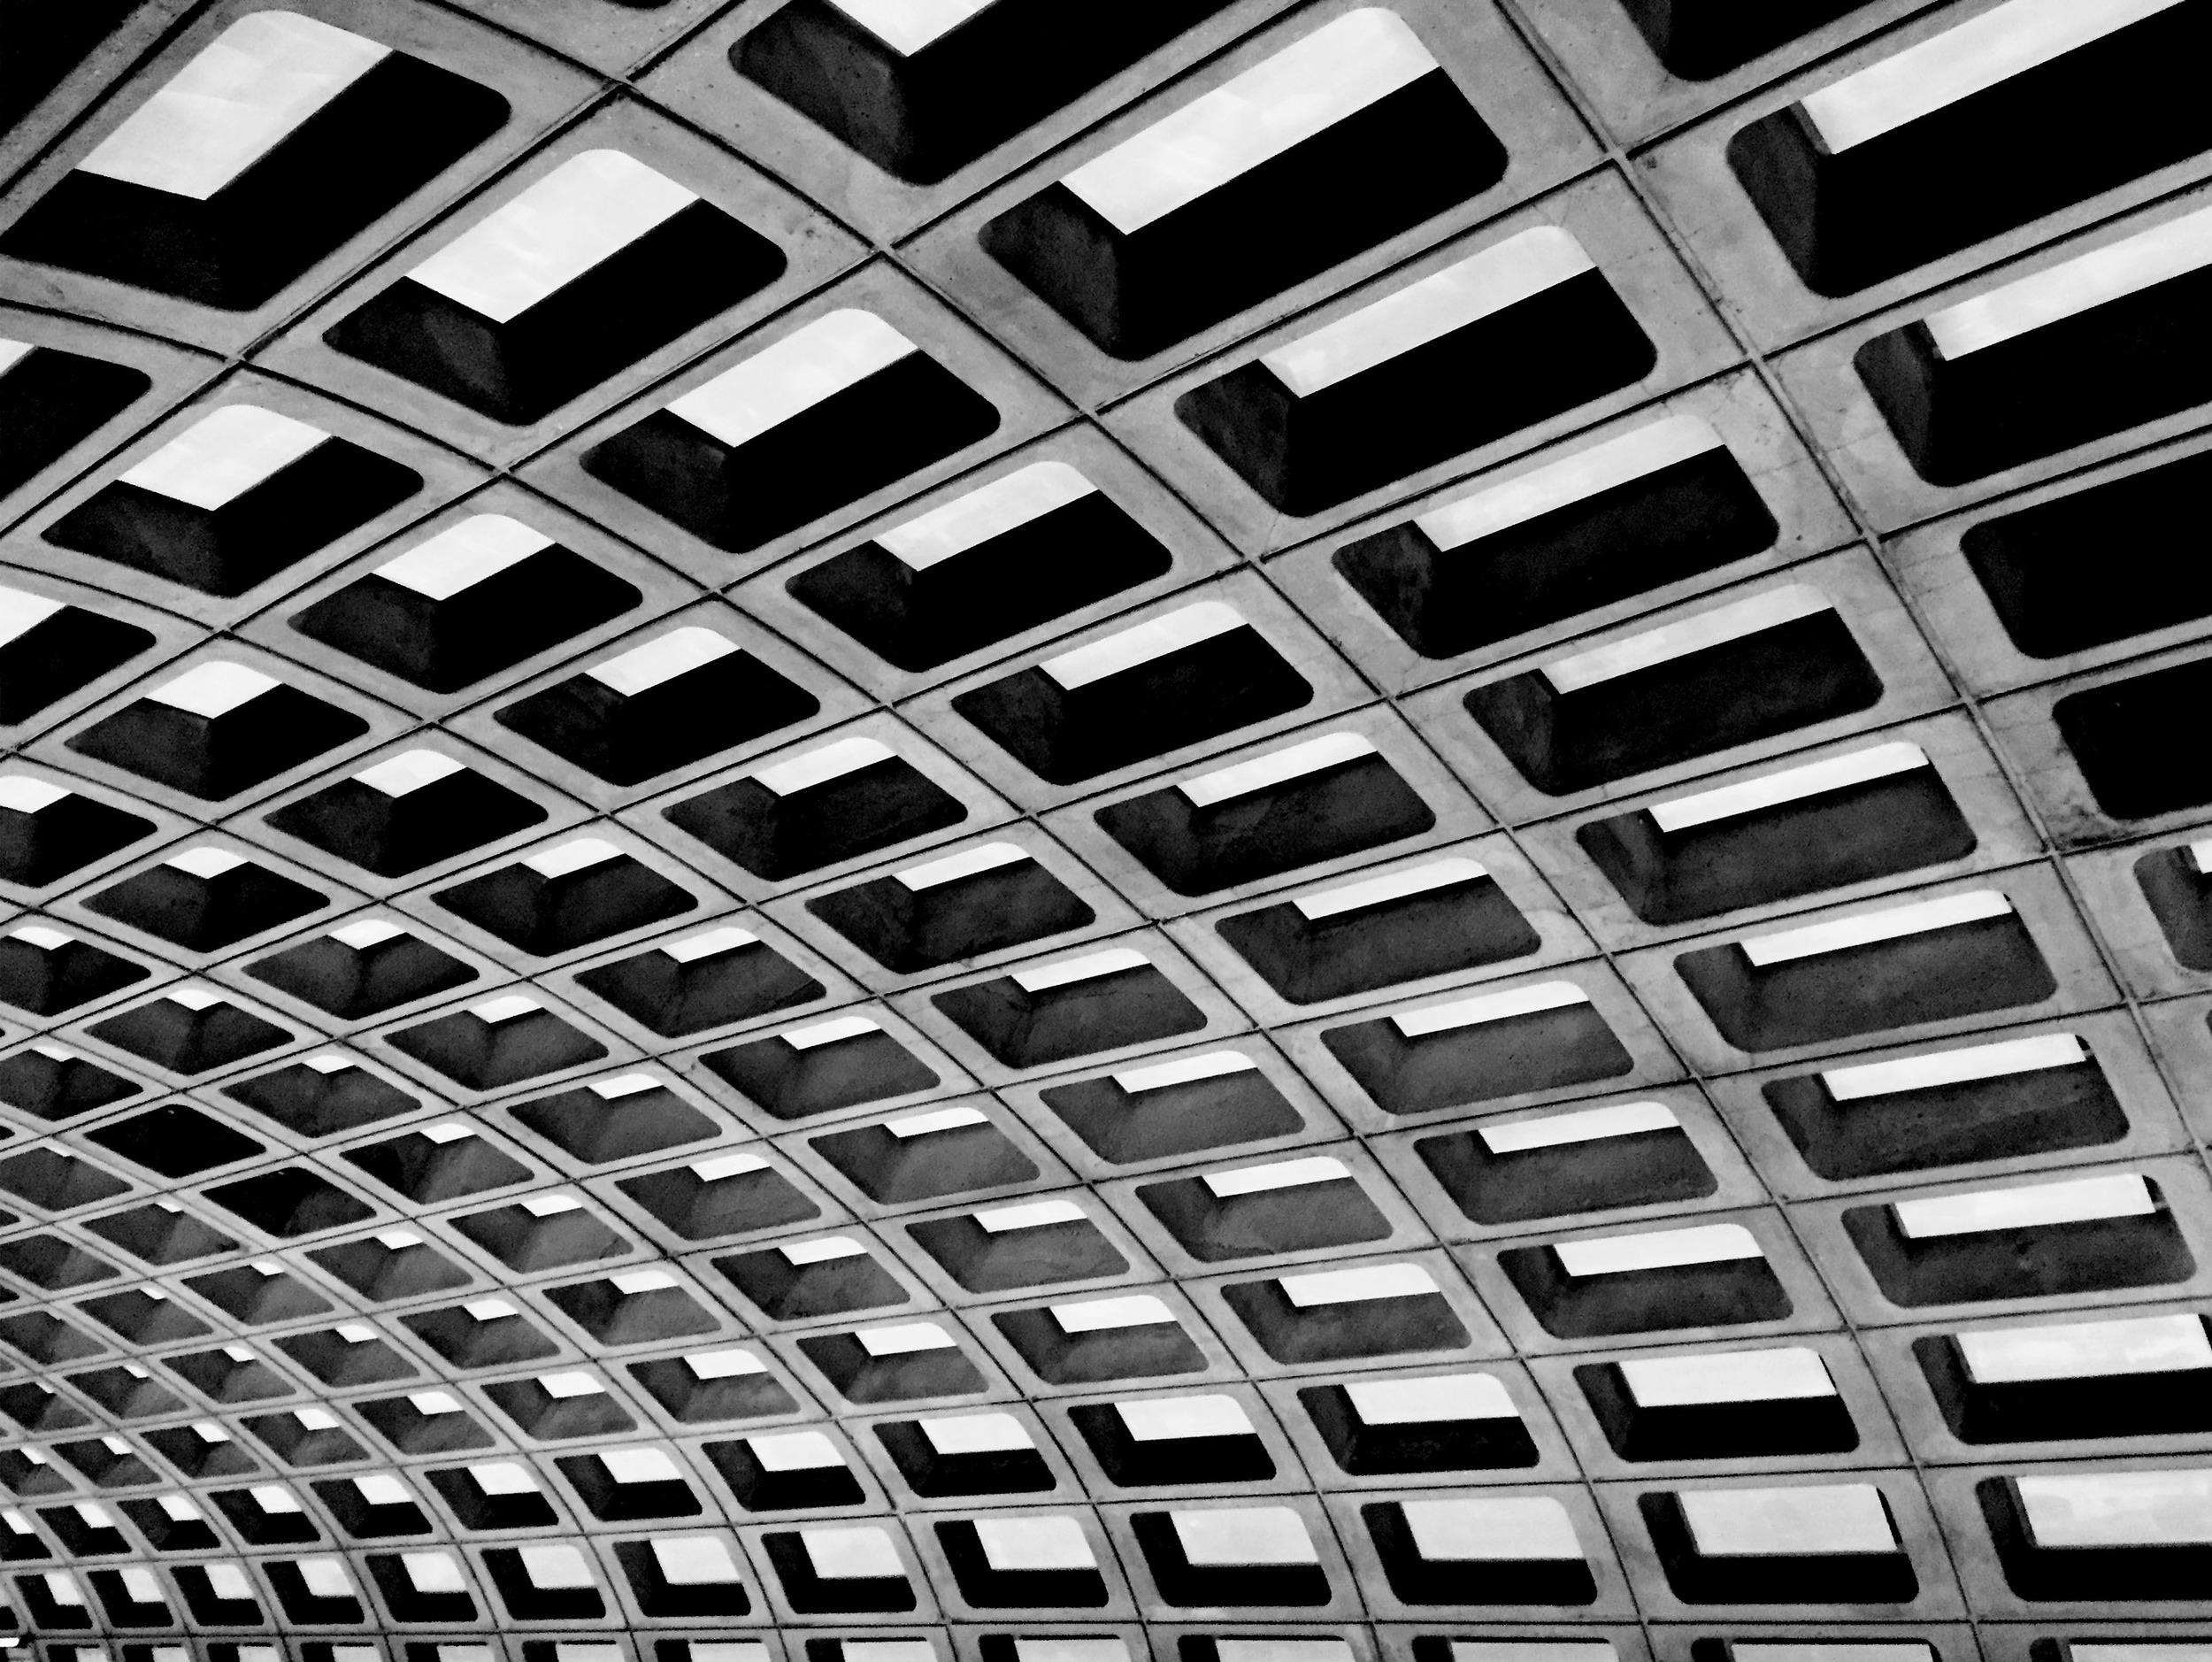 Pentagon City Subway Station.